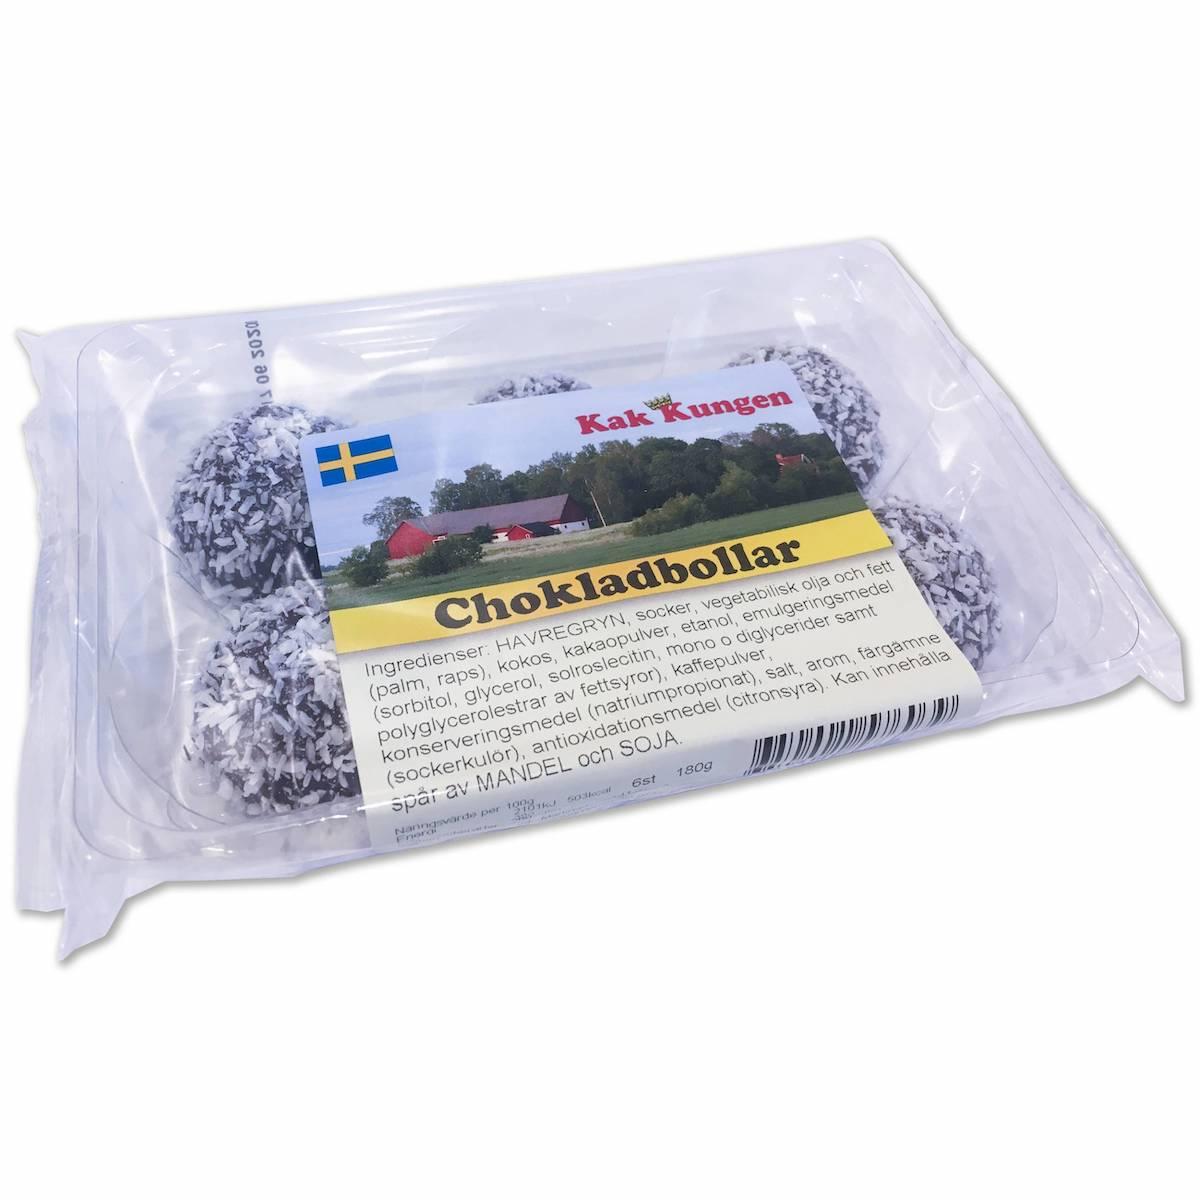 Kak-kungen Chokladboll 6-pack 180g